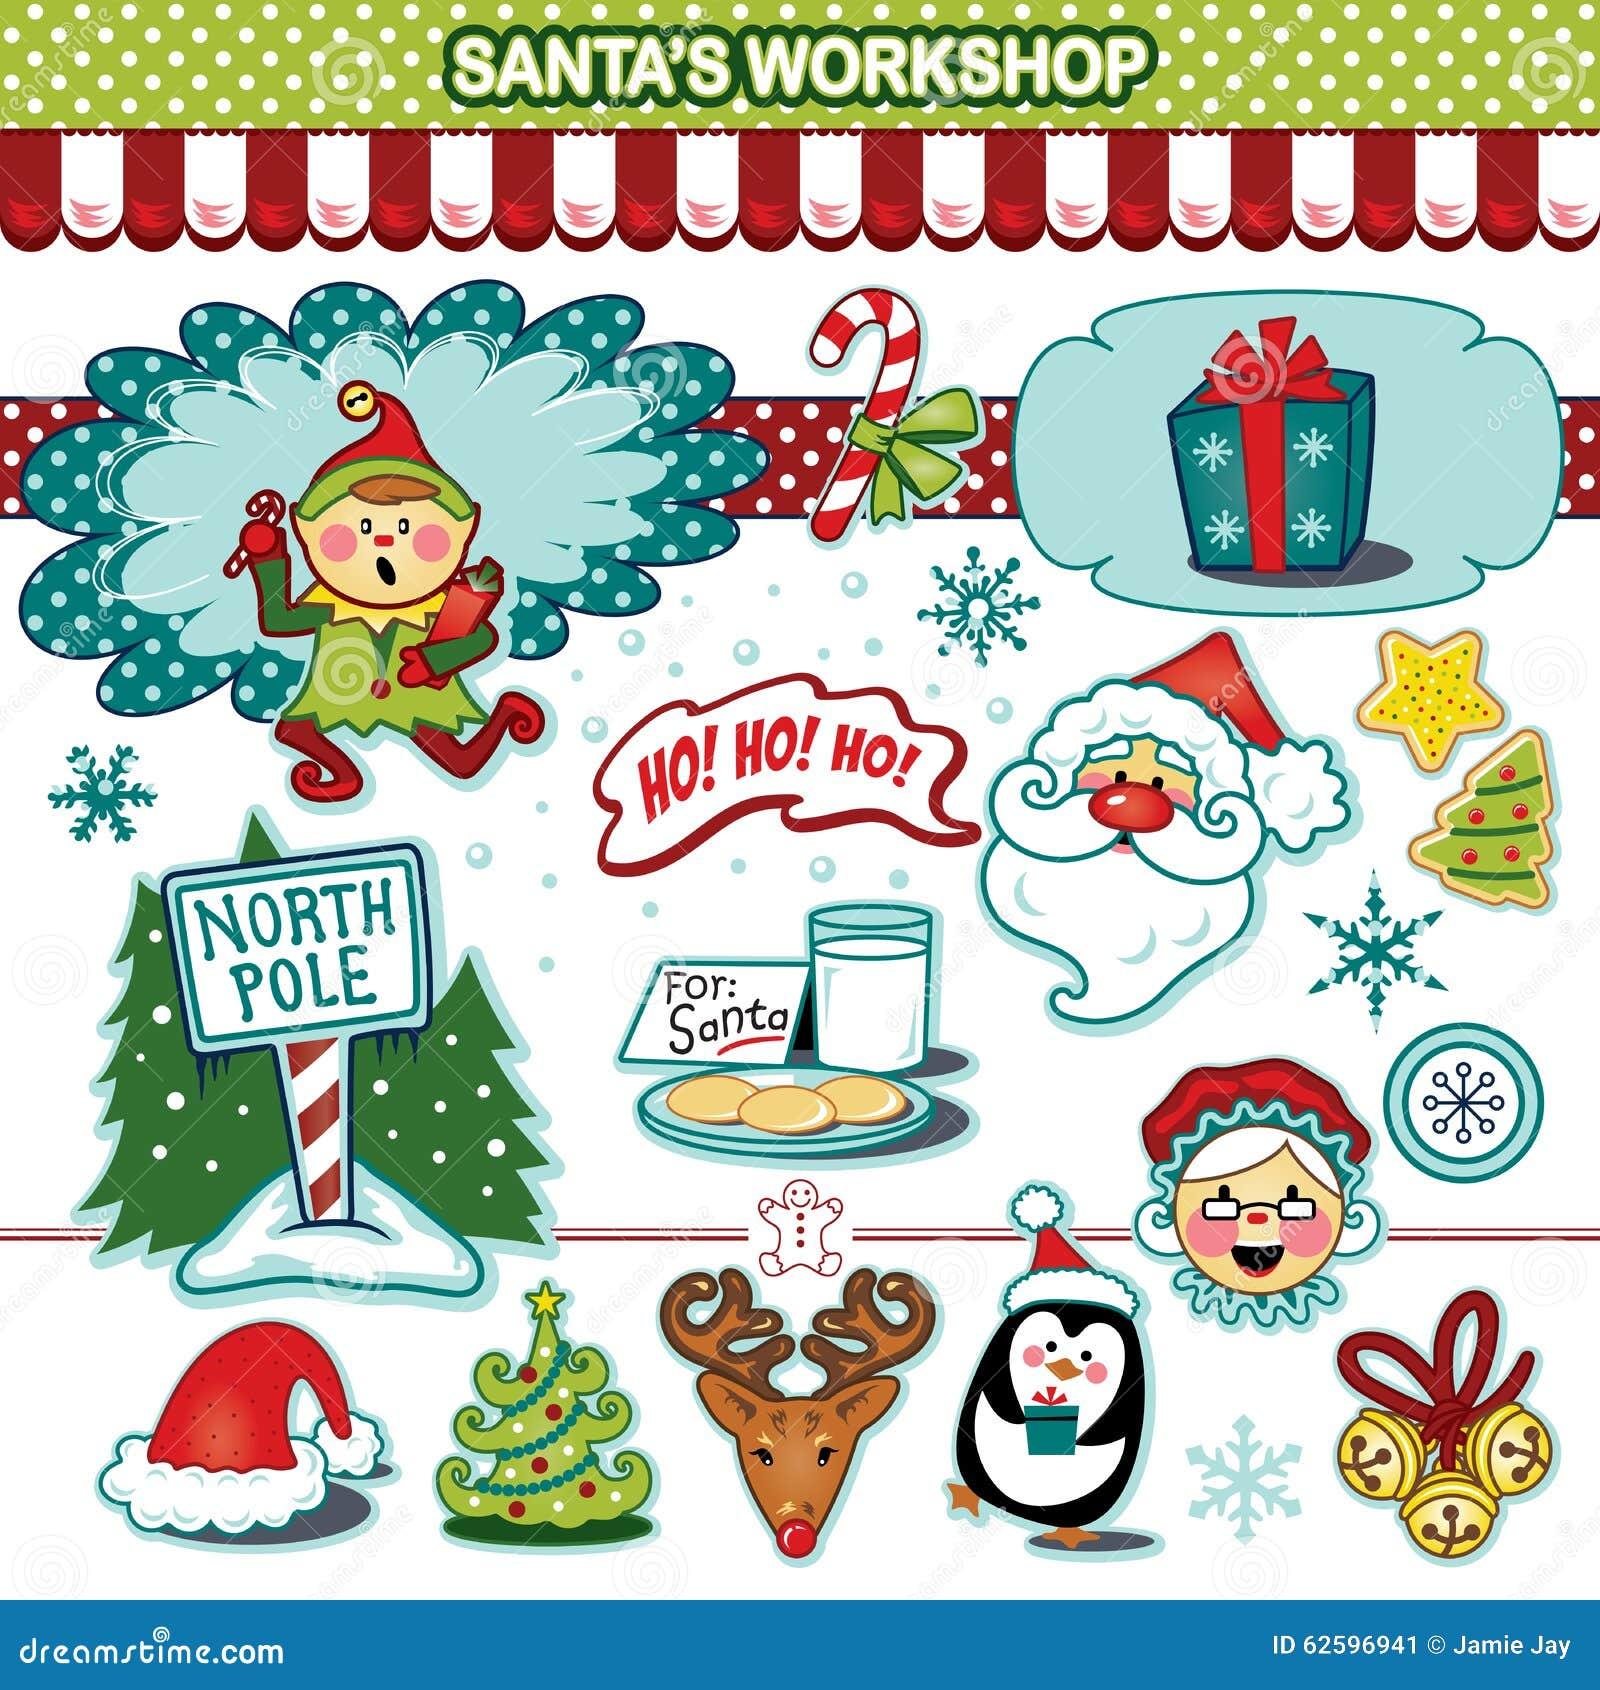 Santa's workshop Christmas holiday illustration collection